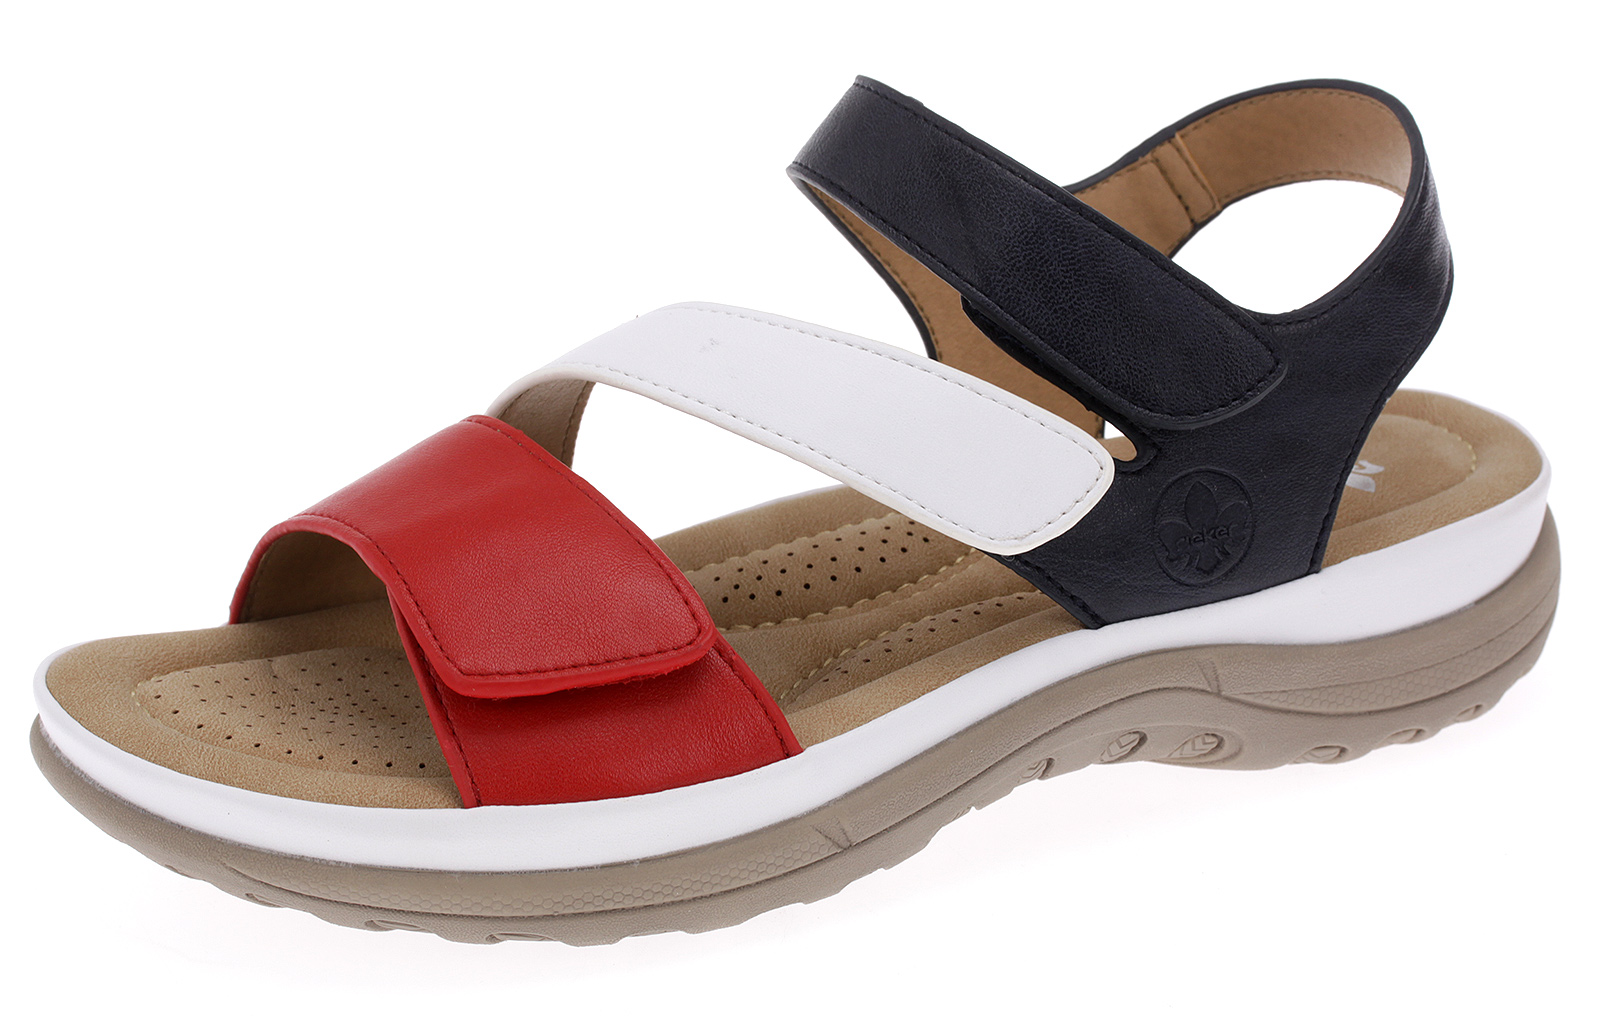 Rieker Sandalette Damen Sandalen Freizeit Sommerschuhe Klettverschluss